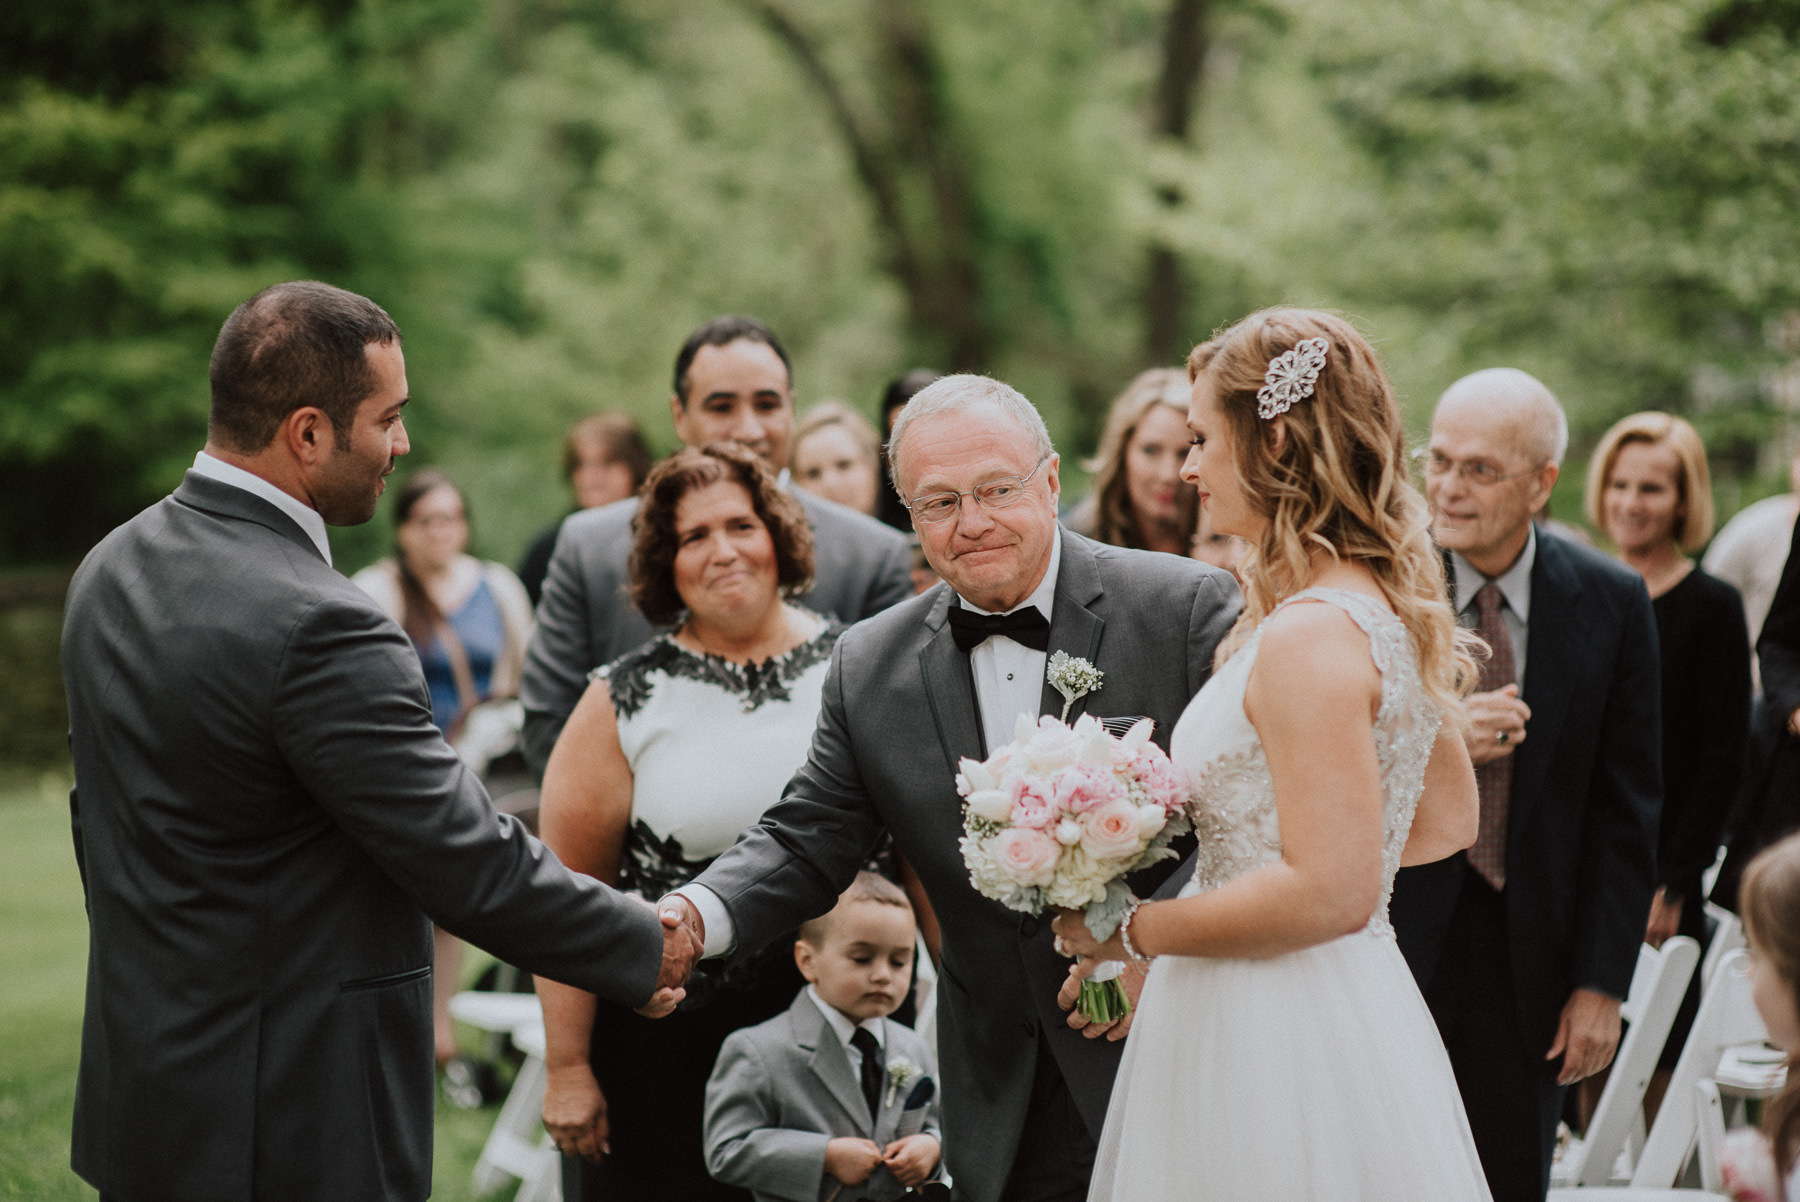 appleford-estate-wedding-photography-56.jpg